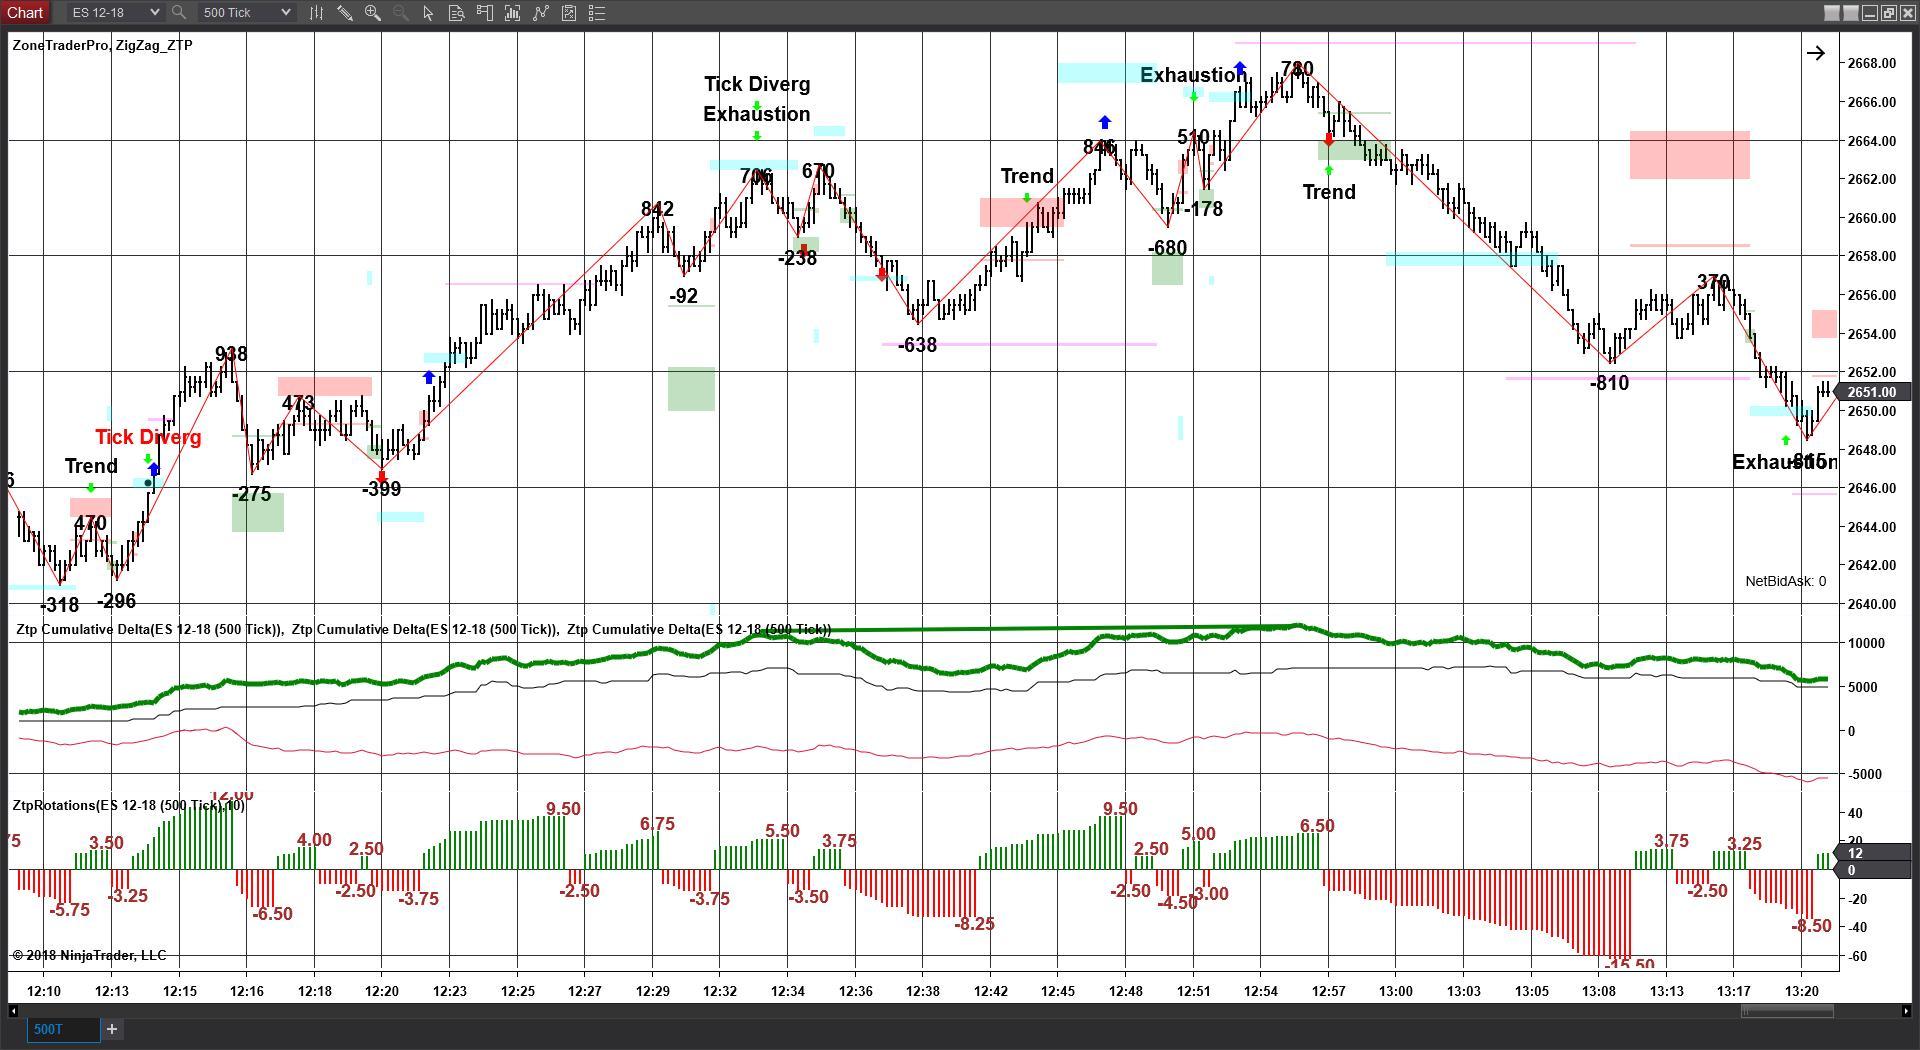 Delta Divergence Indicator